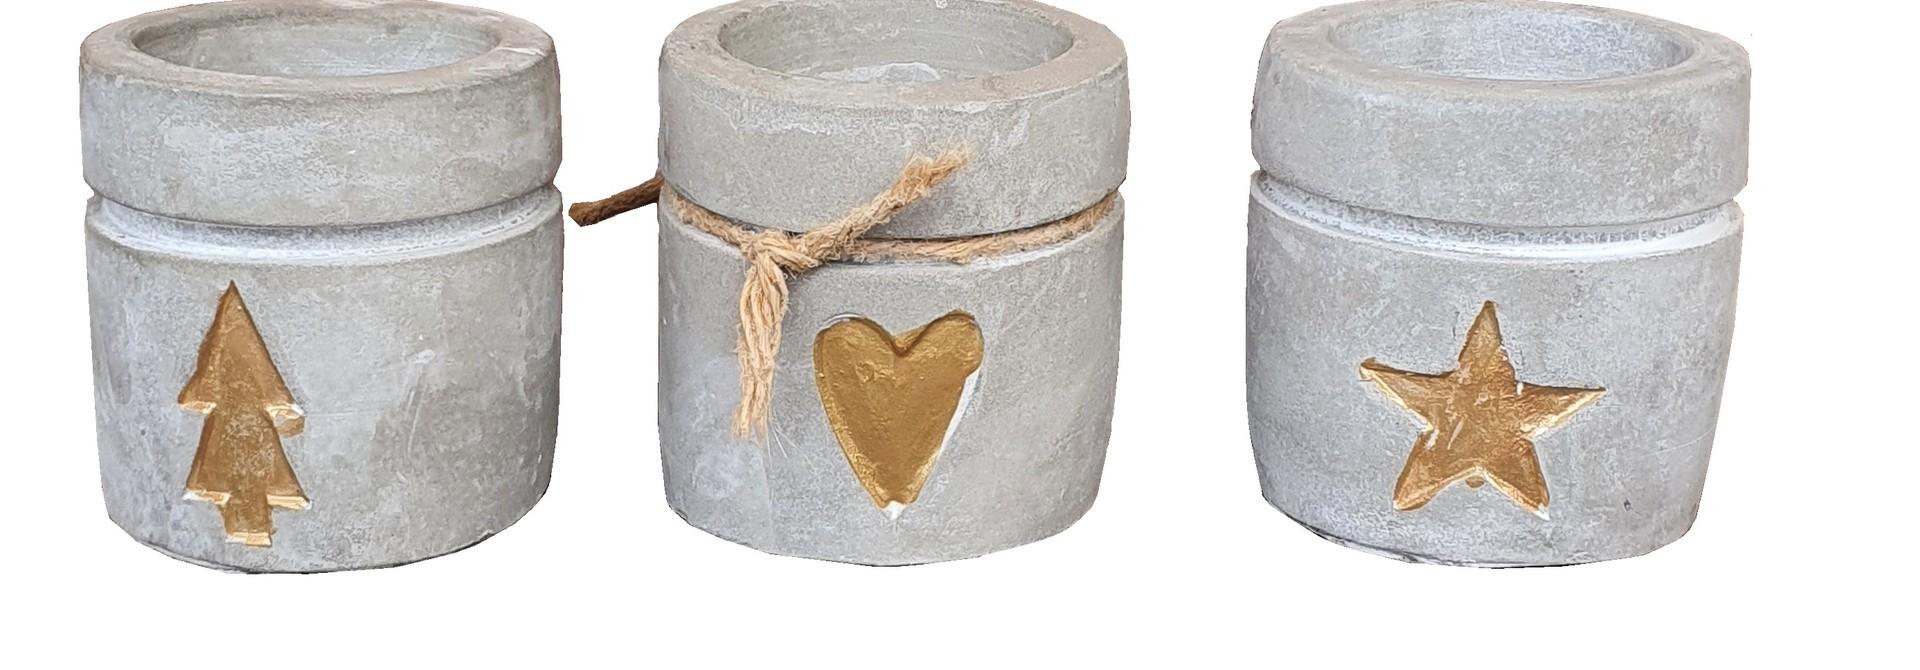 candle hold ceramic concrete gold assort 3